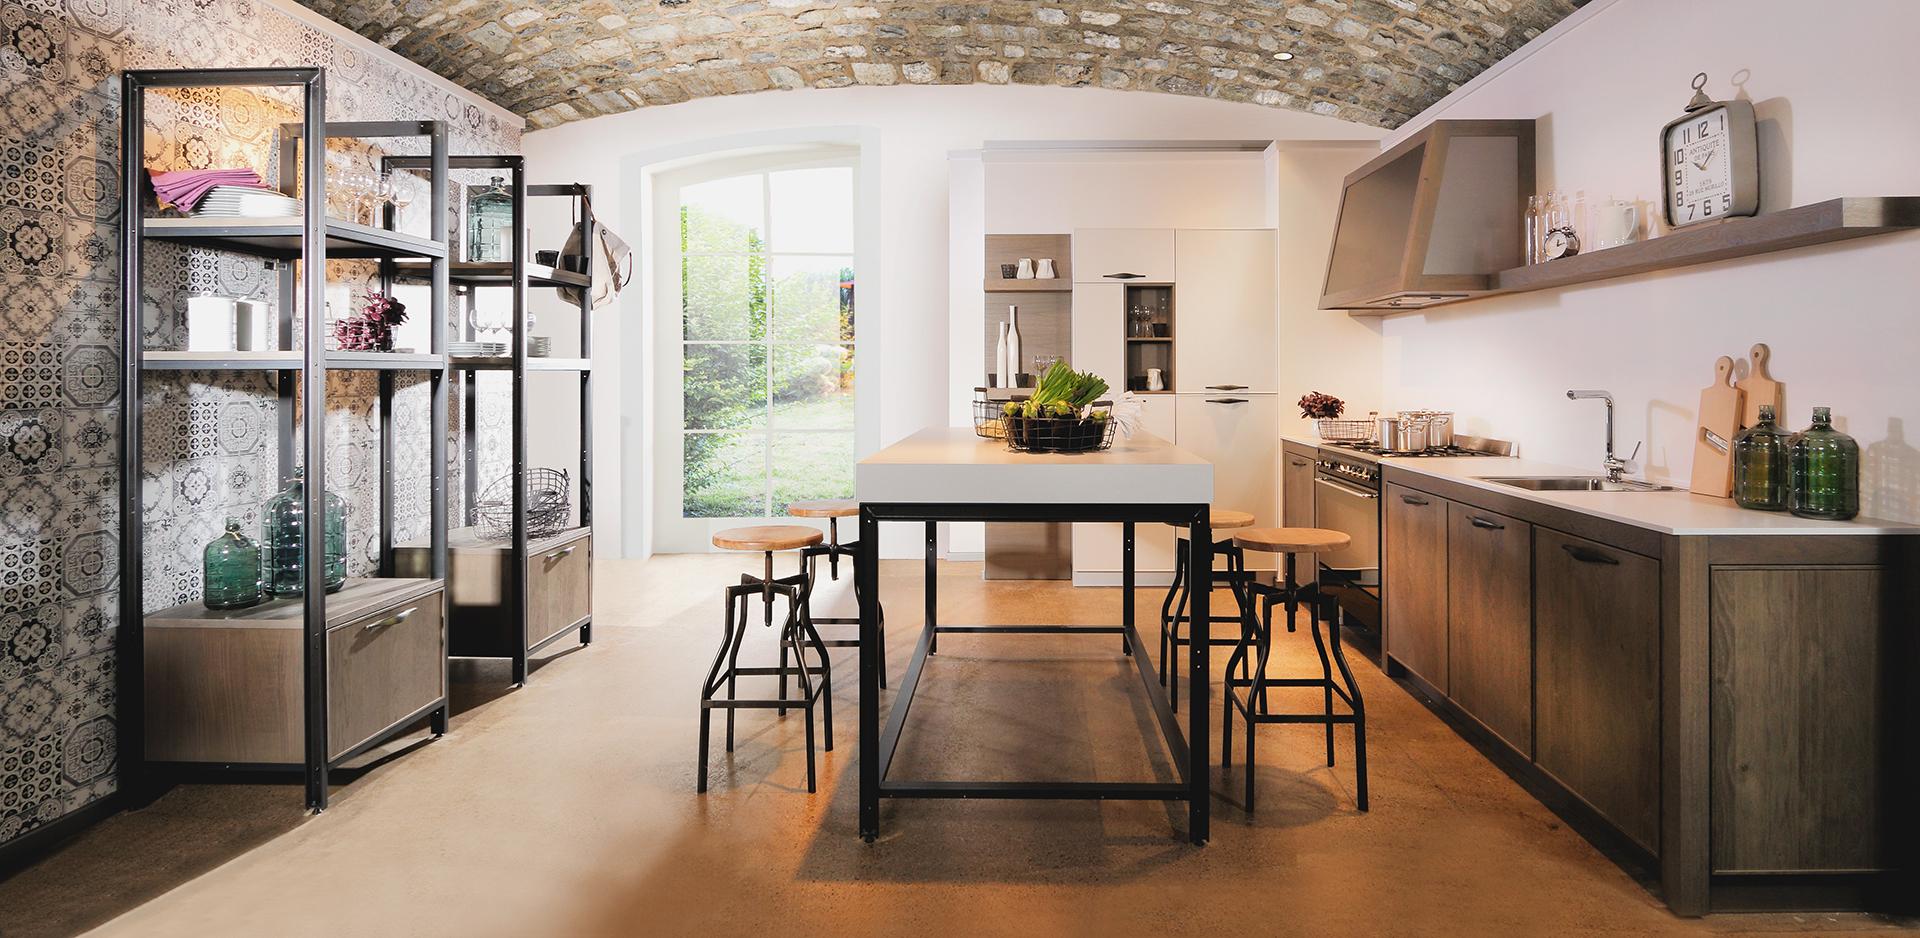 Premium European Kitchens Bauformat